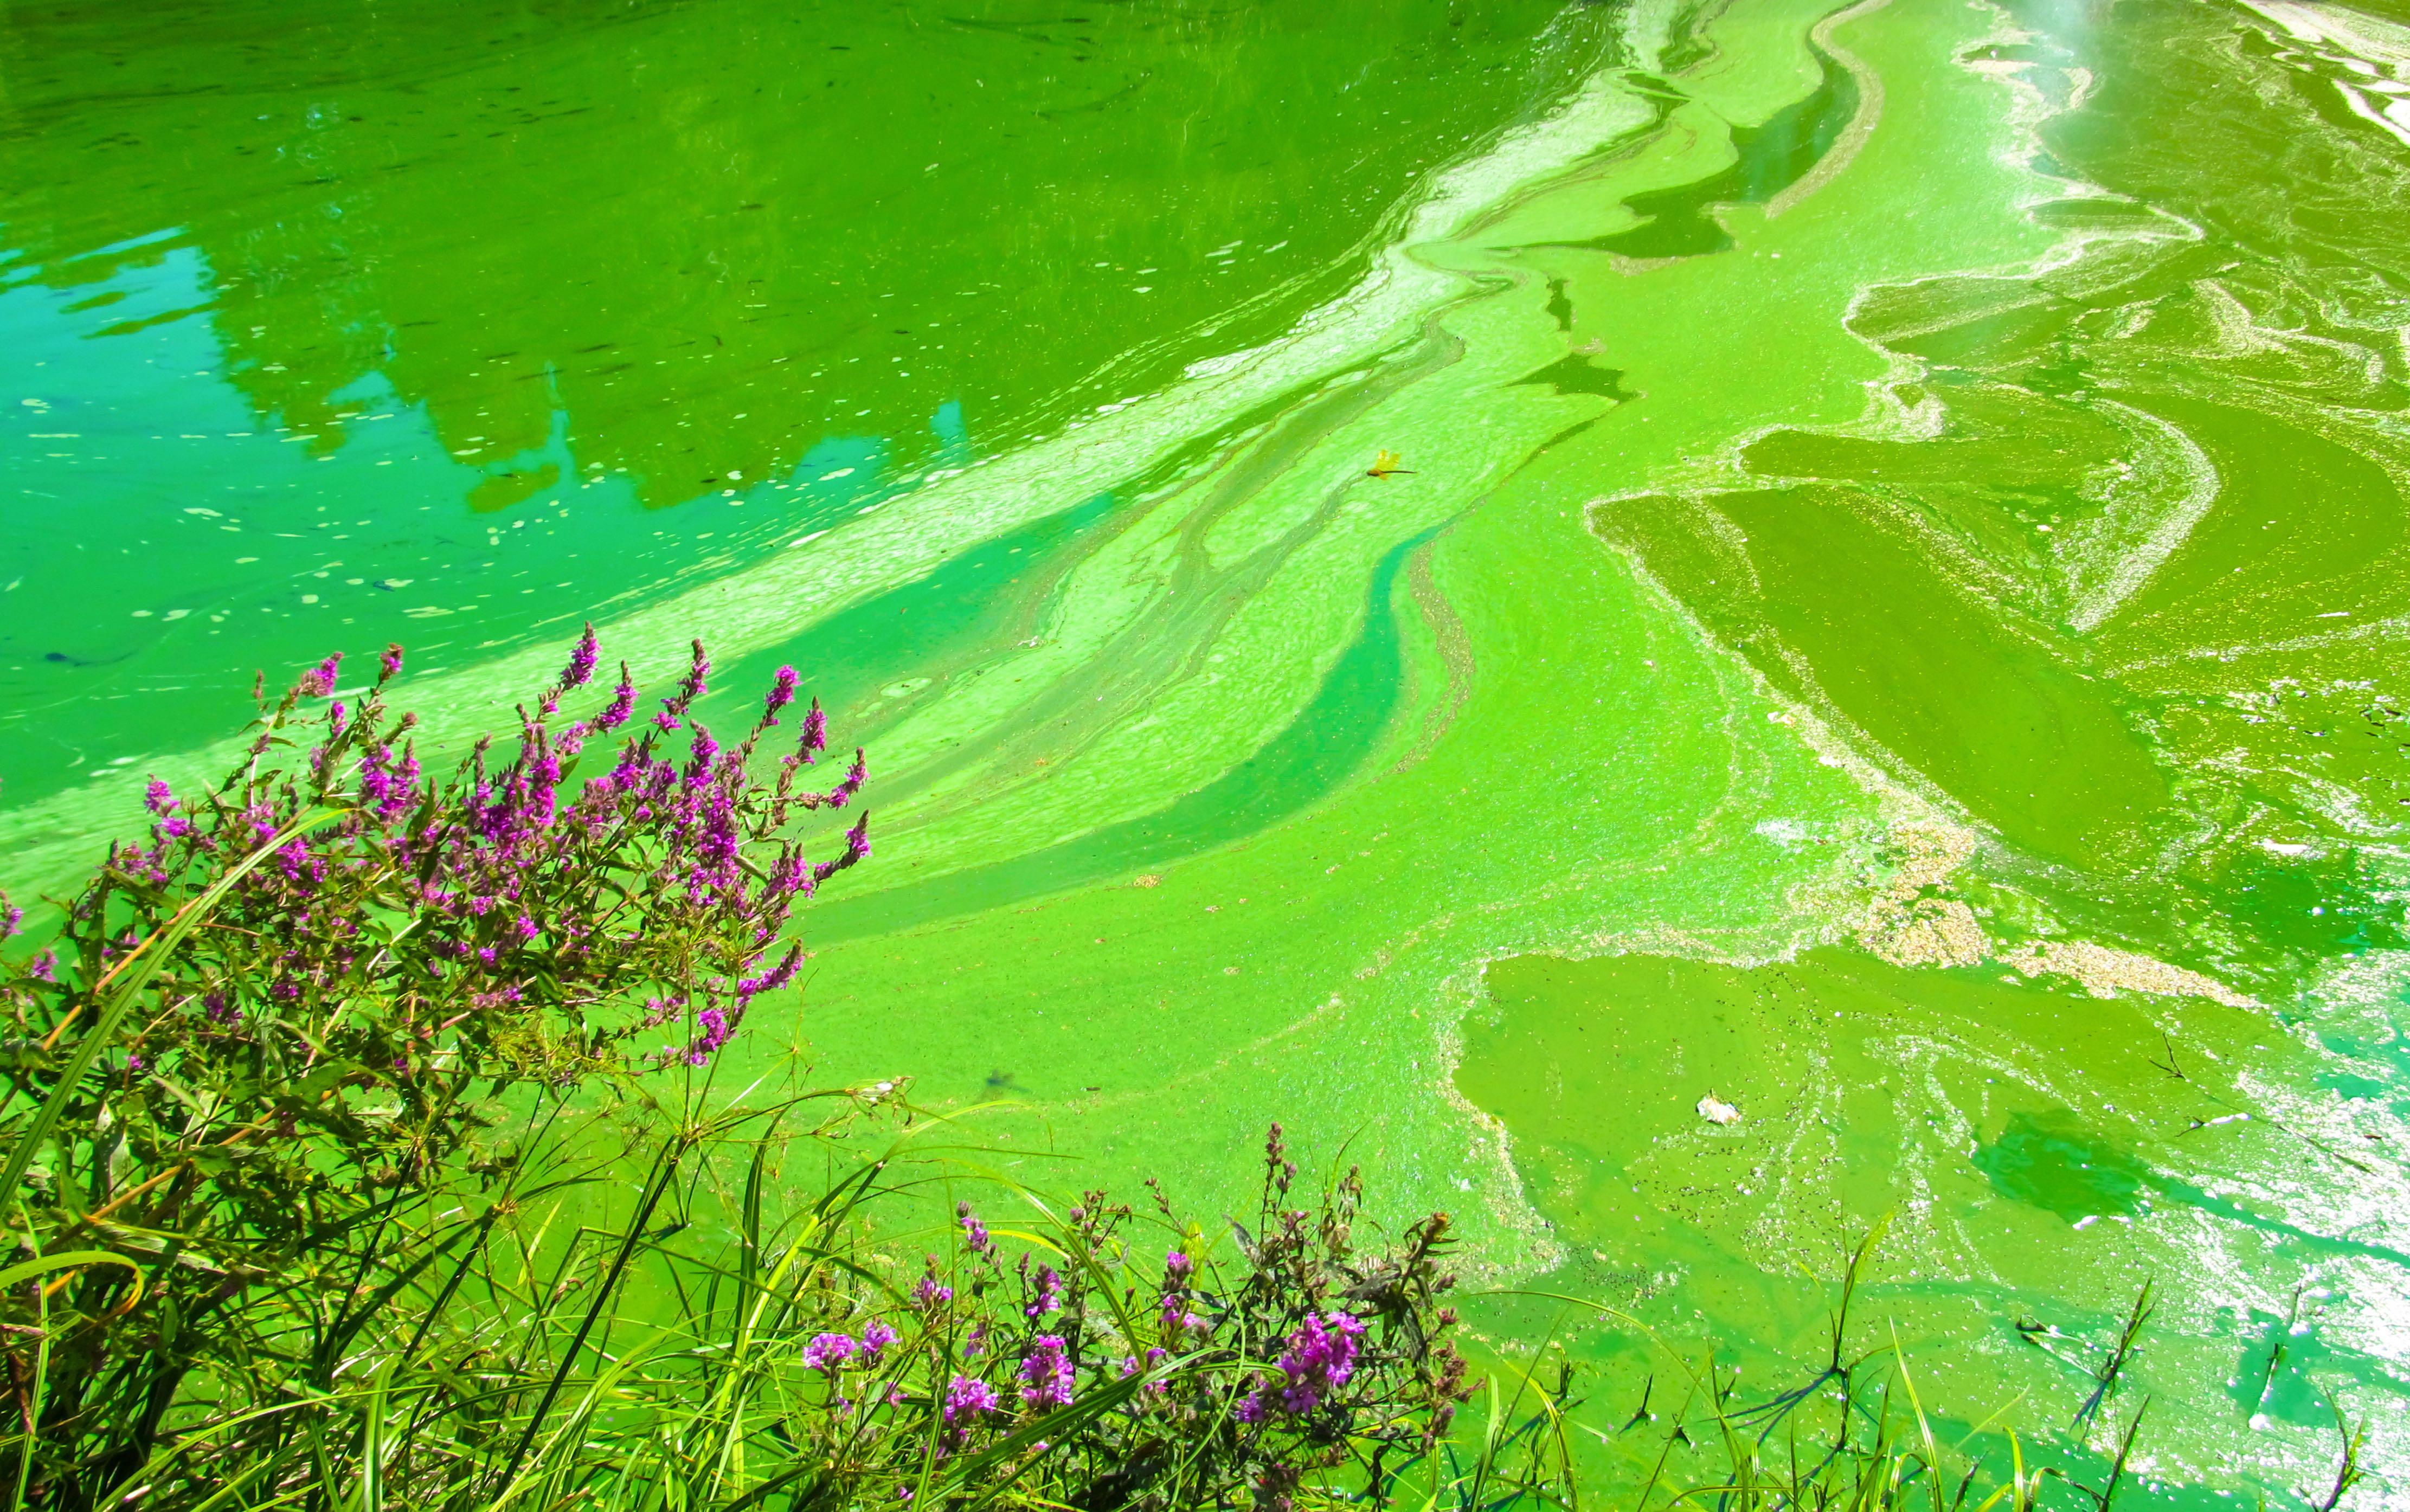 Bright Green Harmful Algal Bloom